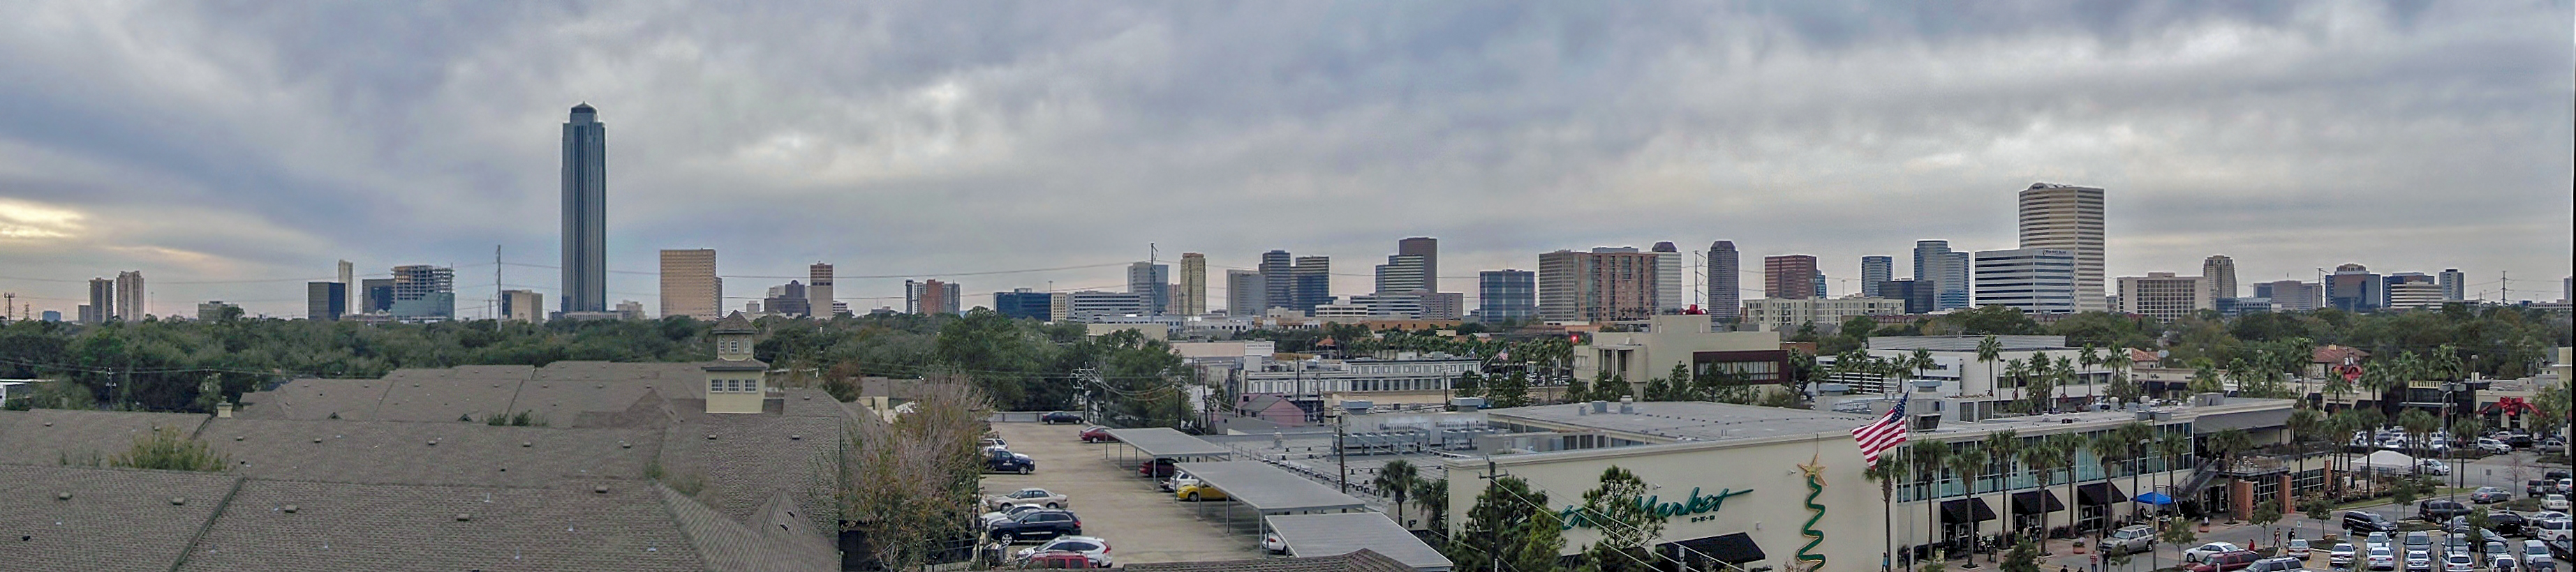 city of corona ca demographics